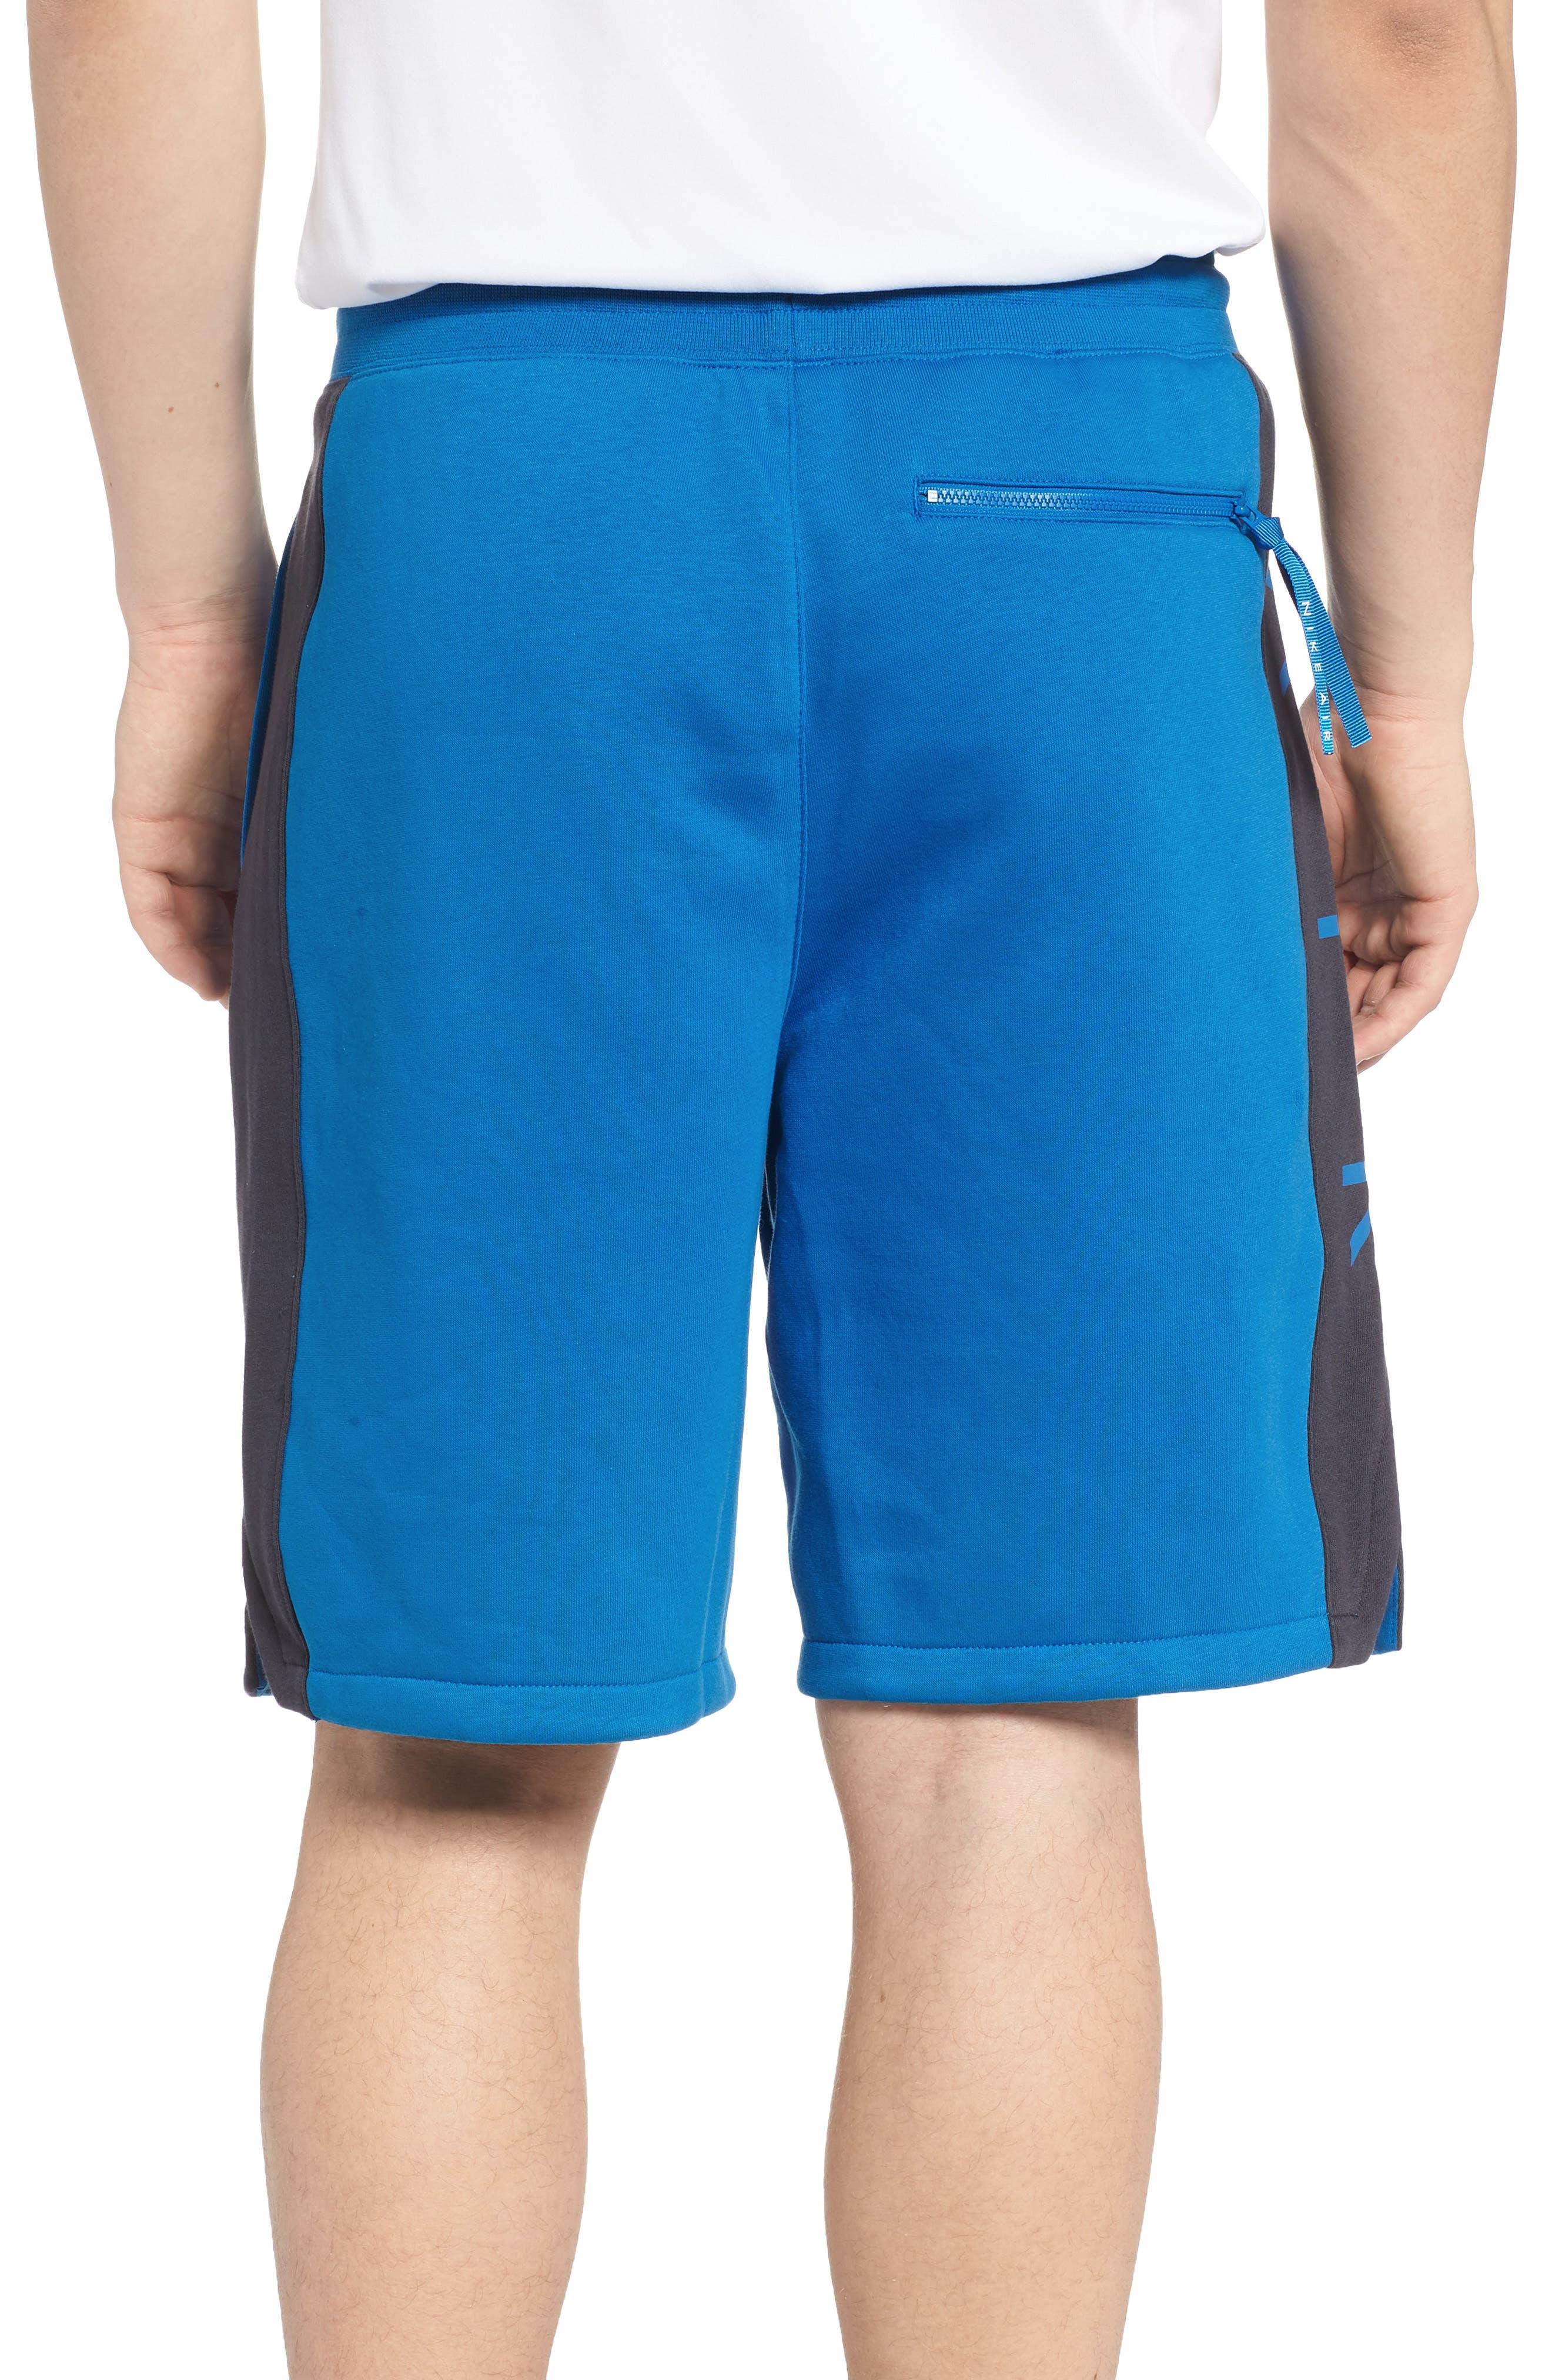 Sportswear Air Fleece Shorts,                             Alternate thumbnail 2, color,                             Blue Nebula/ Anthracite/ White